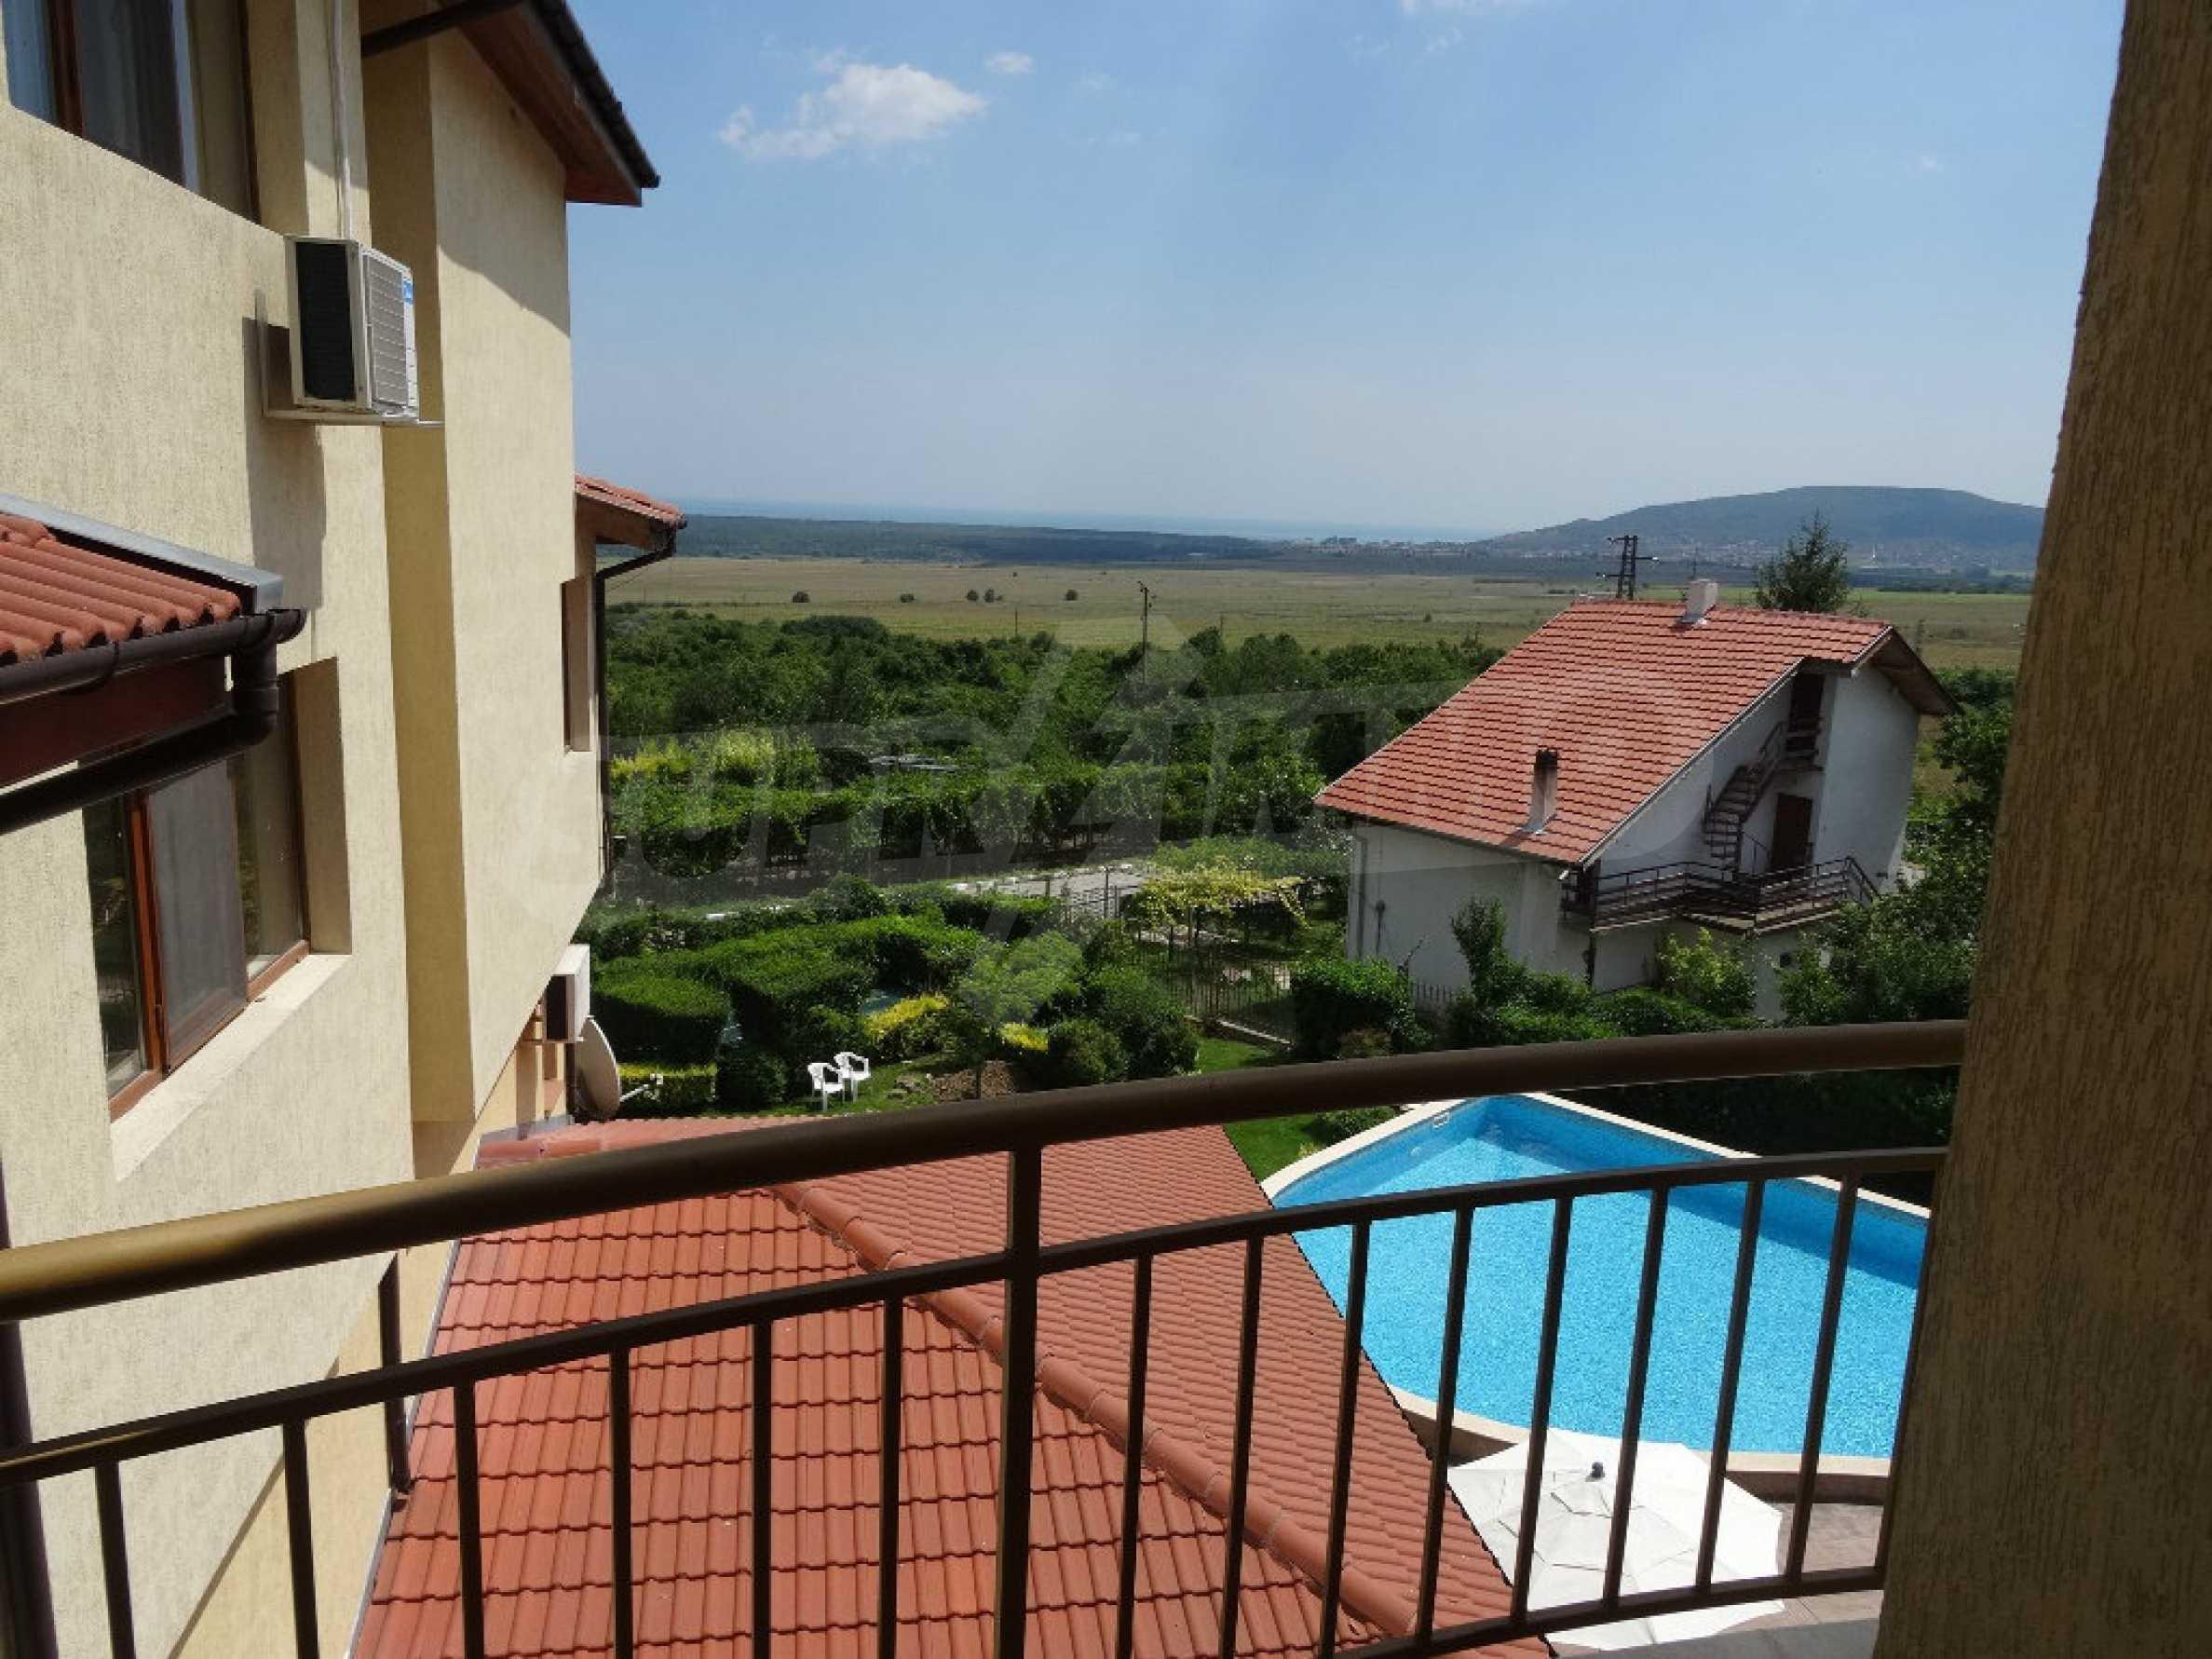 Тристаен апартамент до ключ близо до курорти Албена и Кранево 7